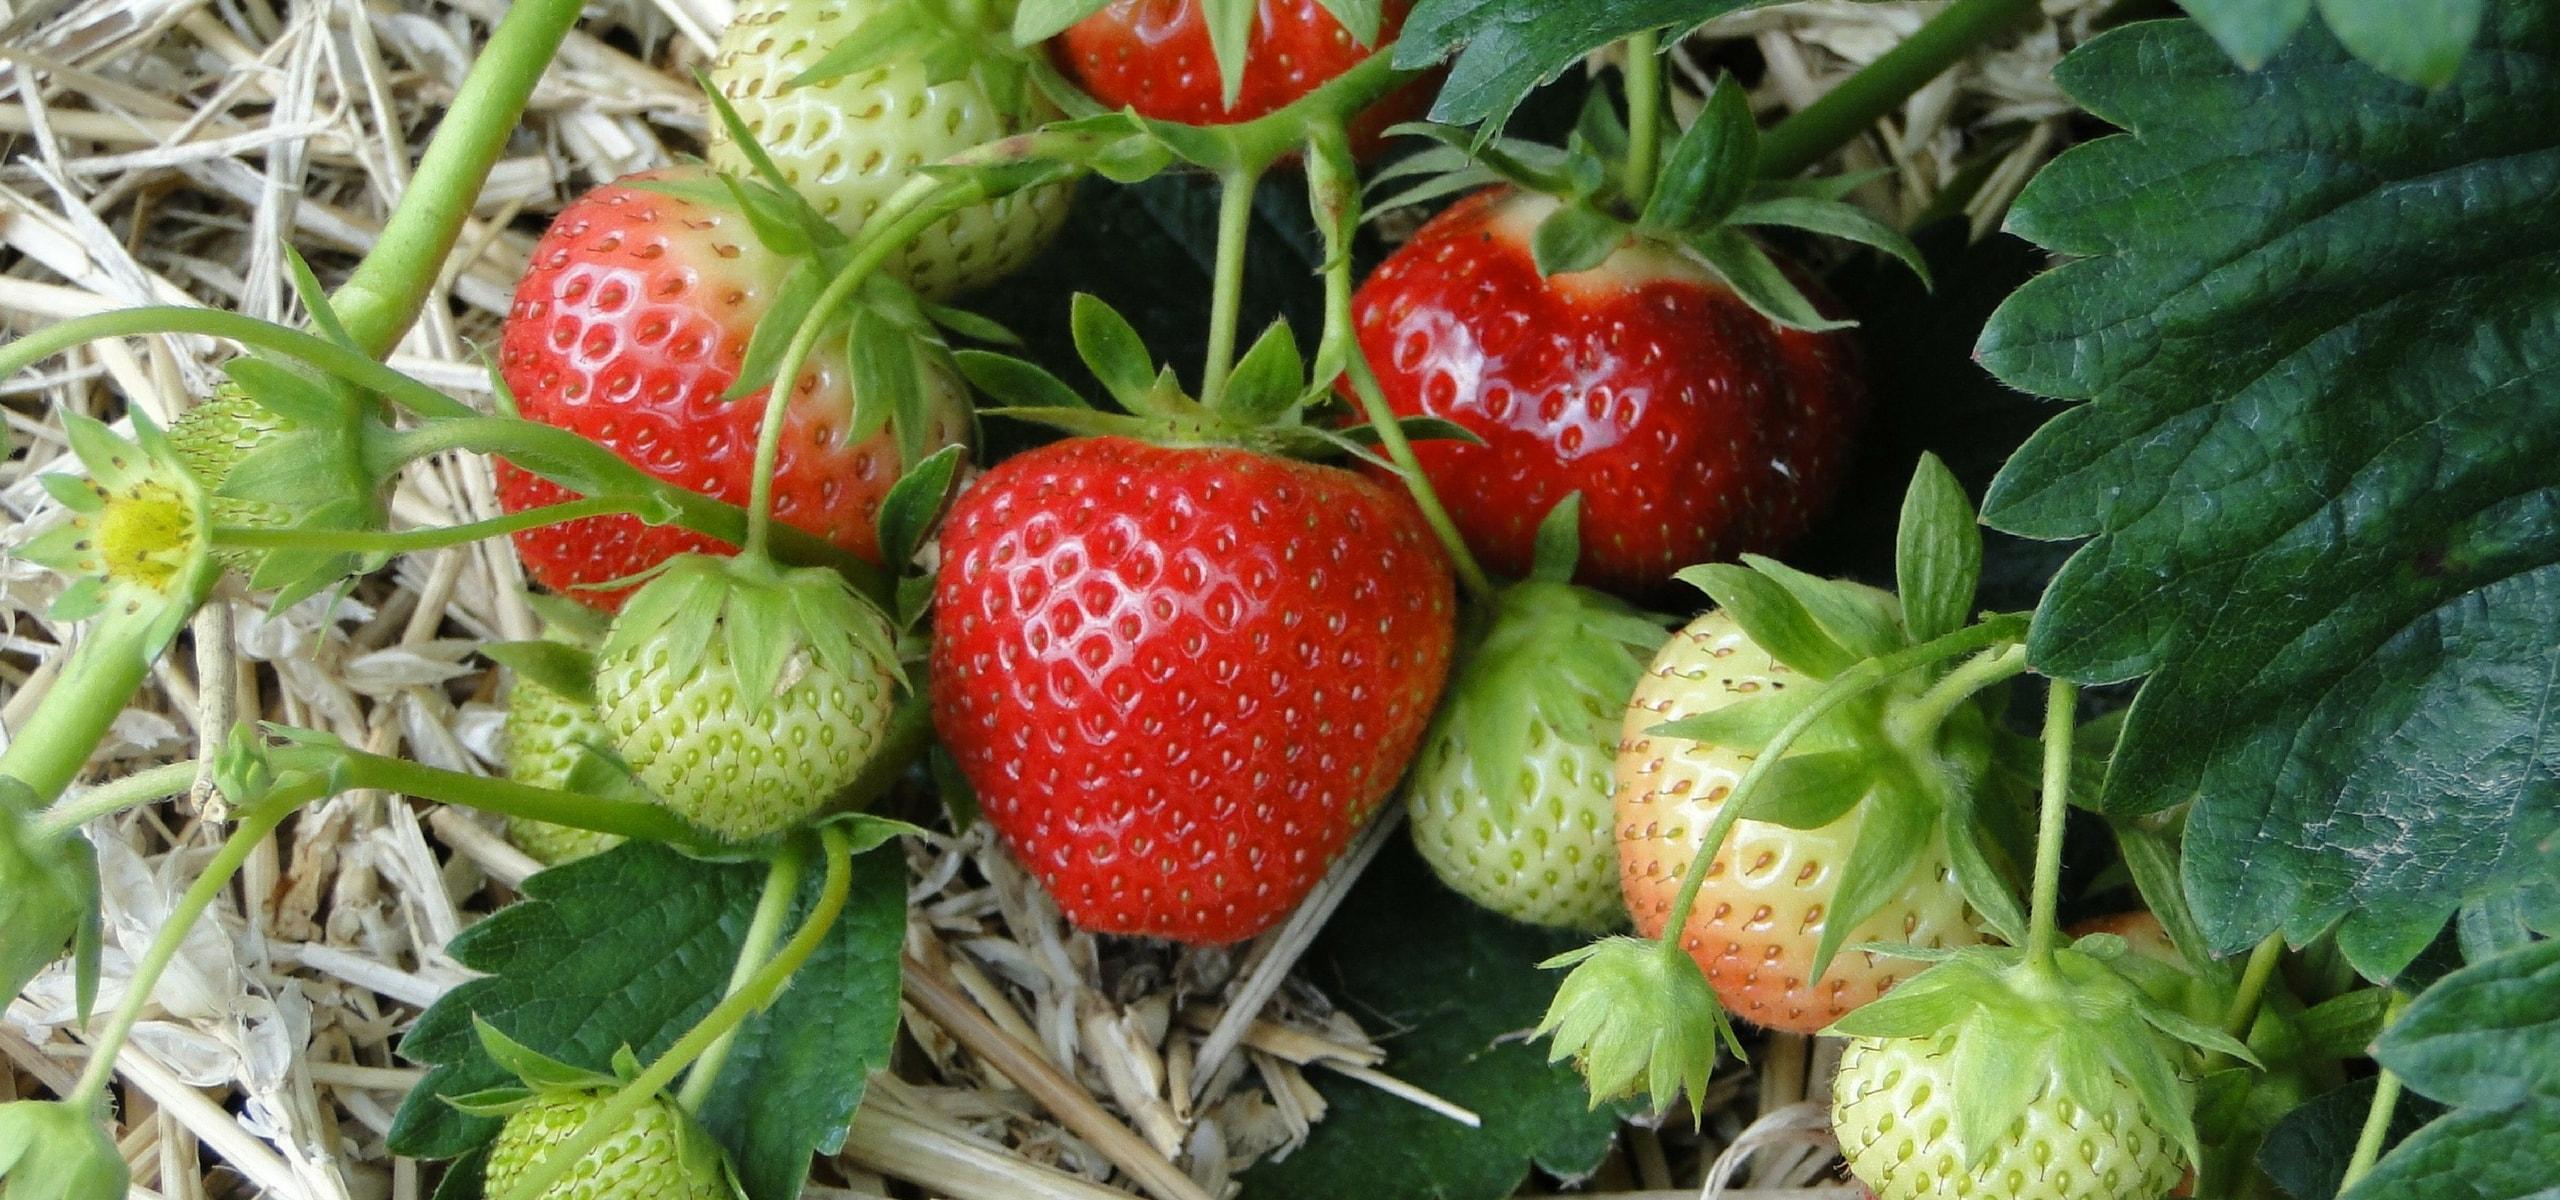 Culture fraisier en pot fraisier uananasupot diamtre - Fraisier en pot entretien ...